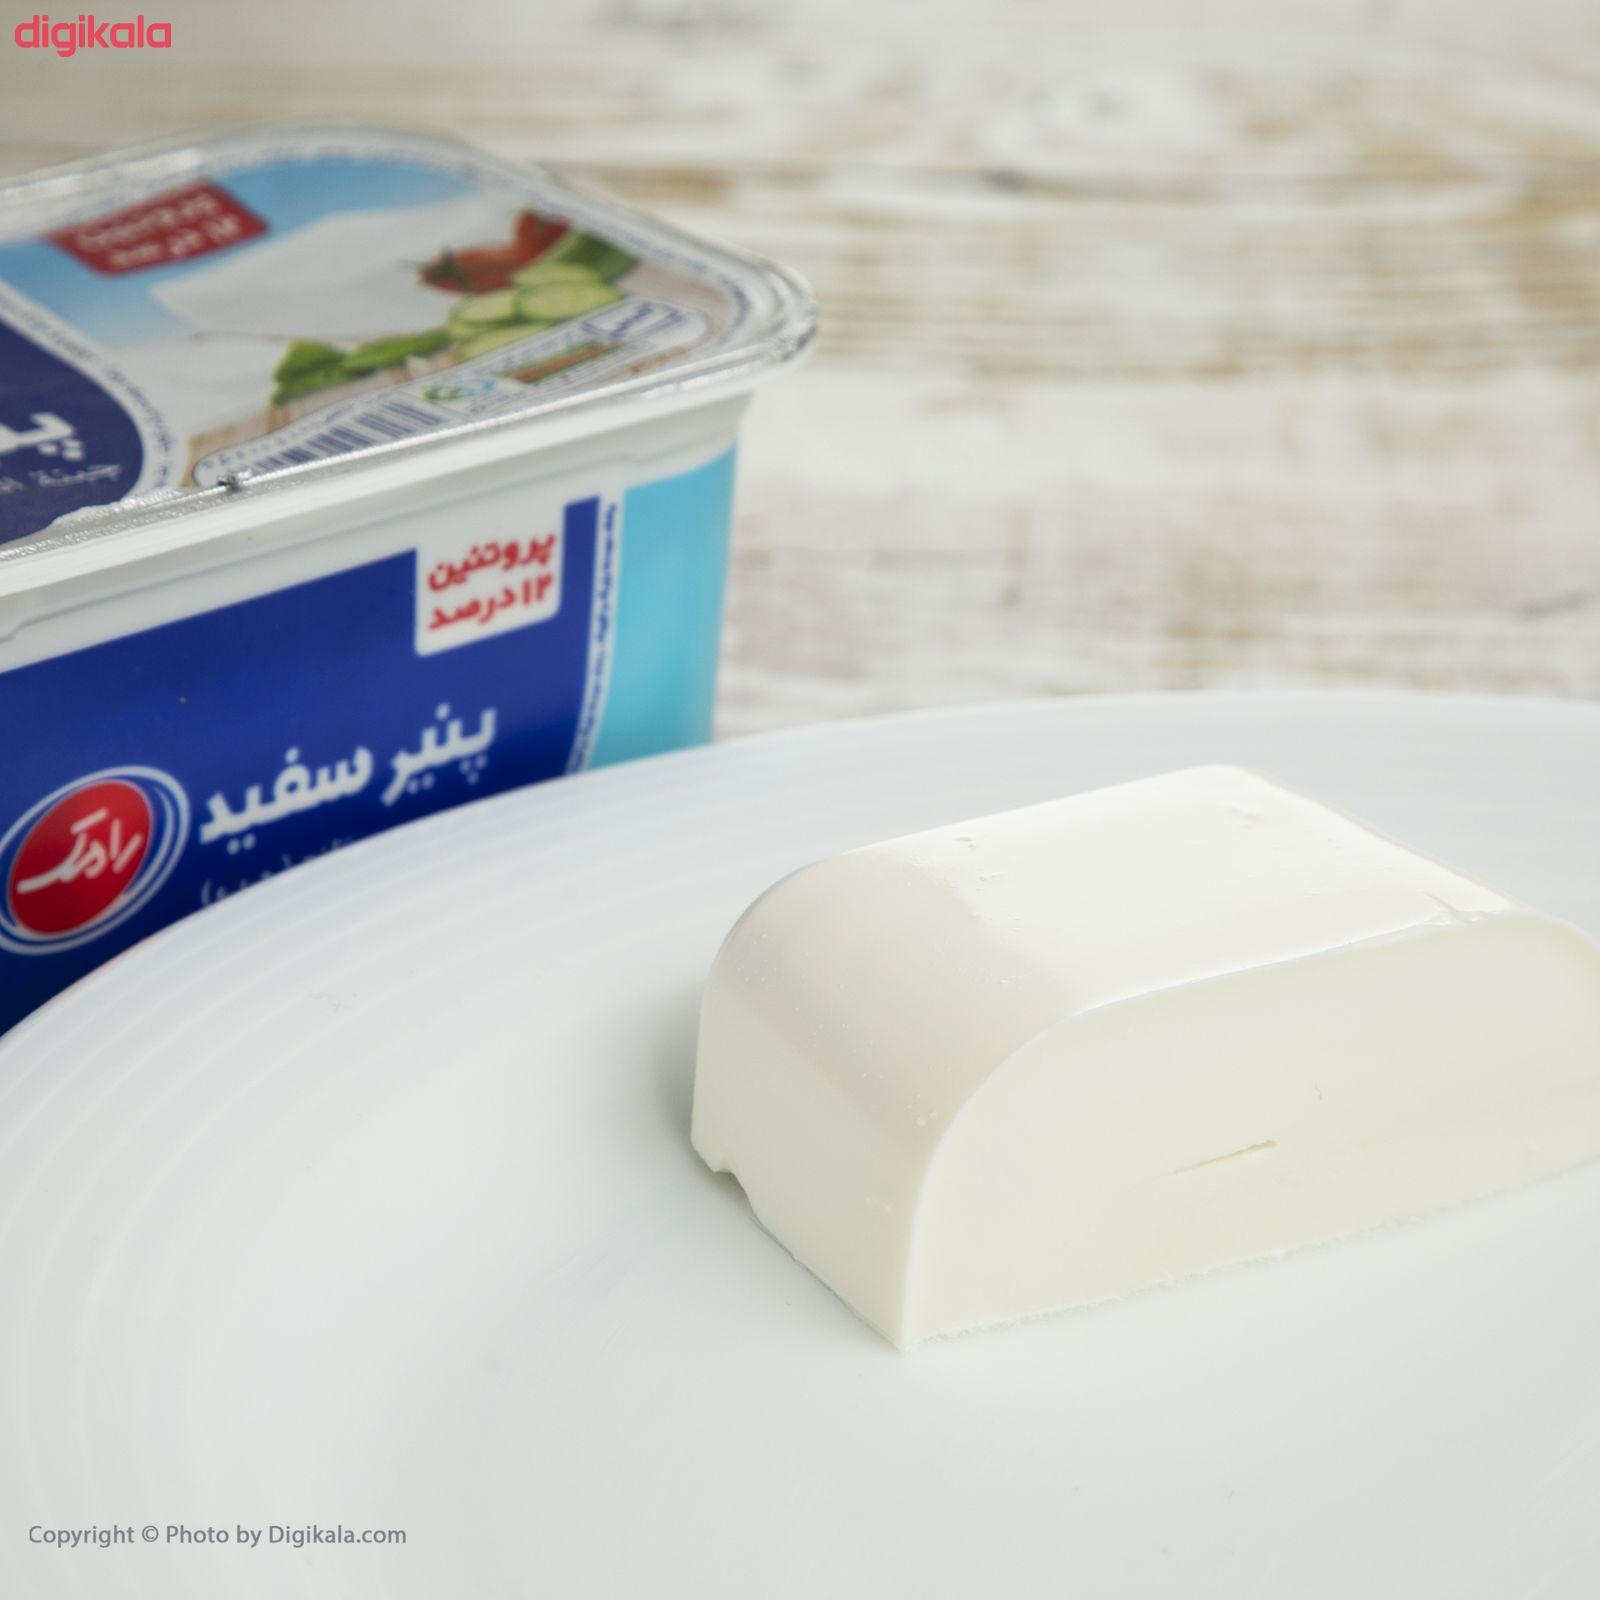 پنیر سفید رامک وزن 400 گرم main 1 6